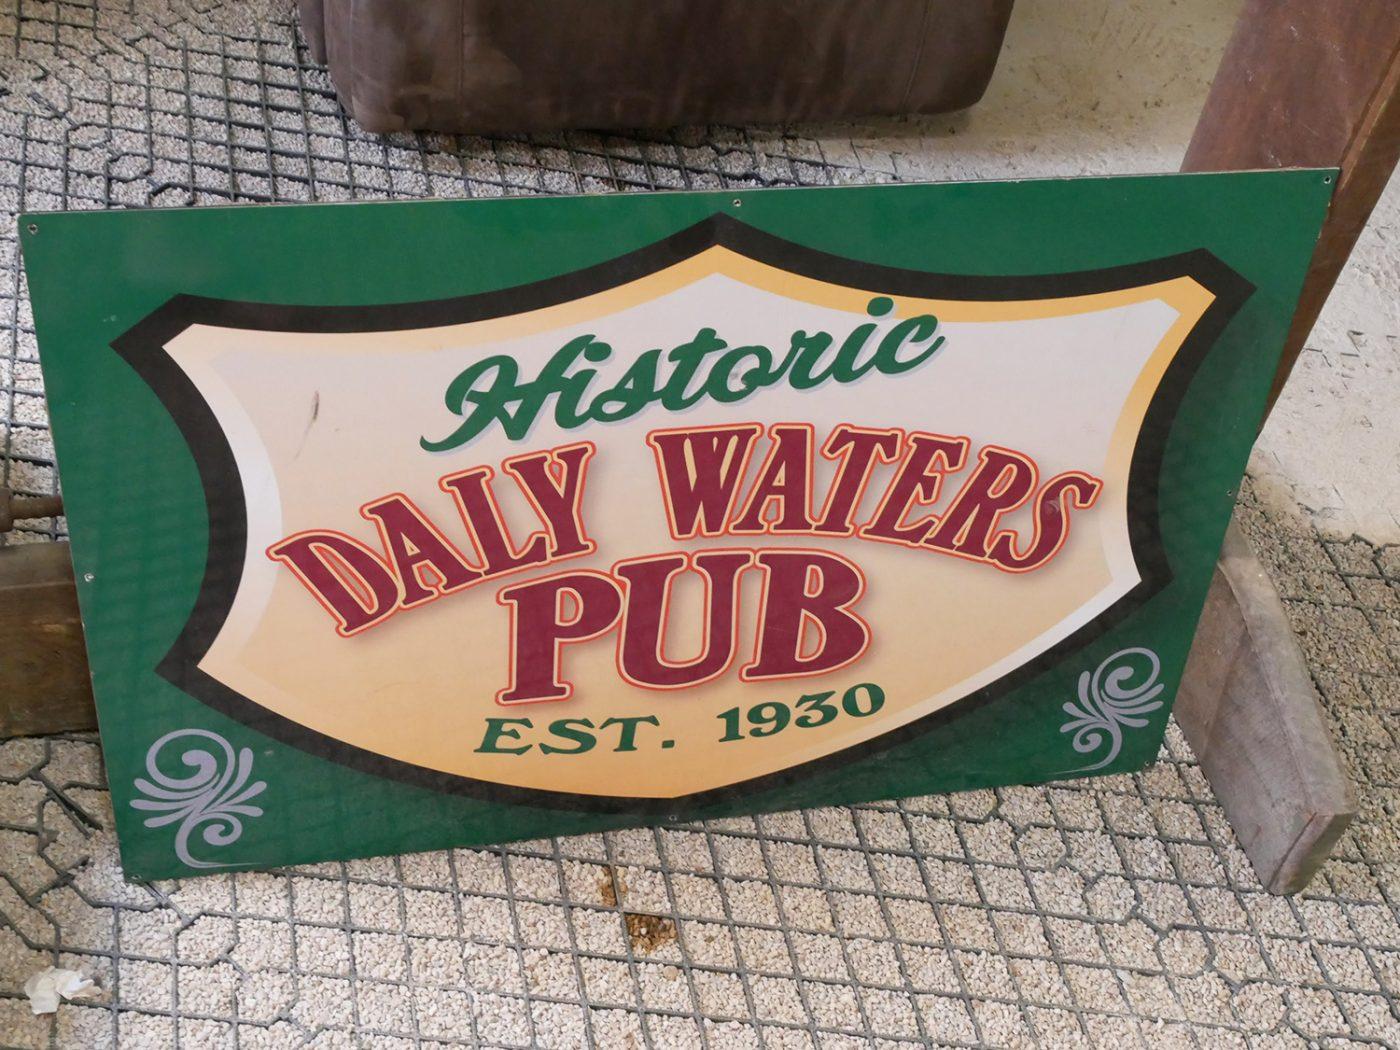 The historic Daly Water Pub in Australia